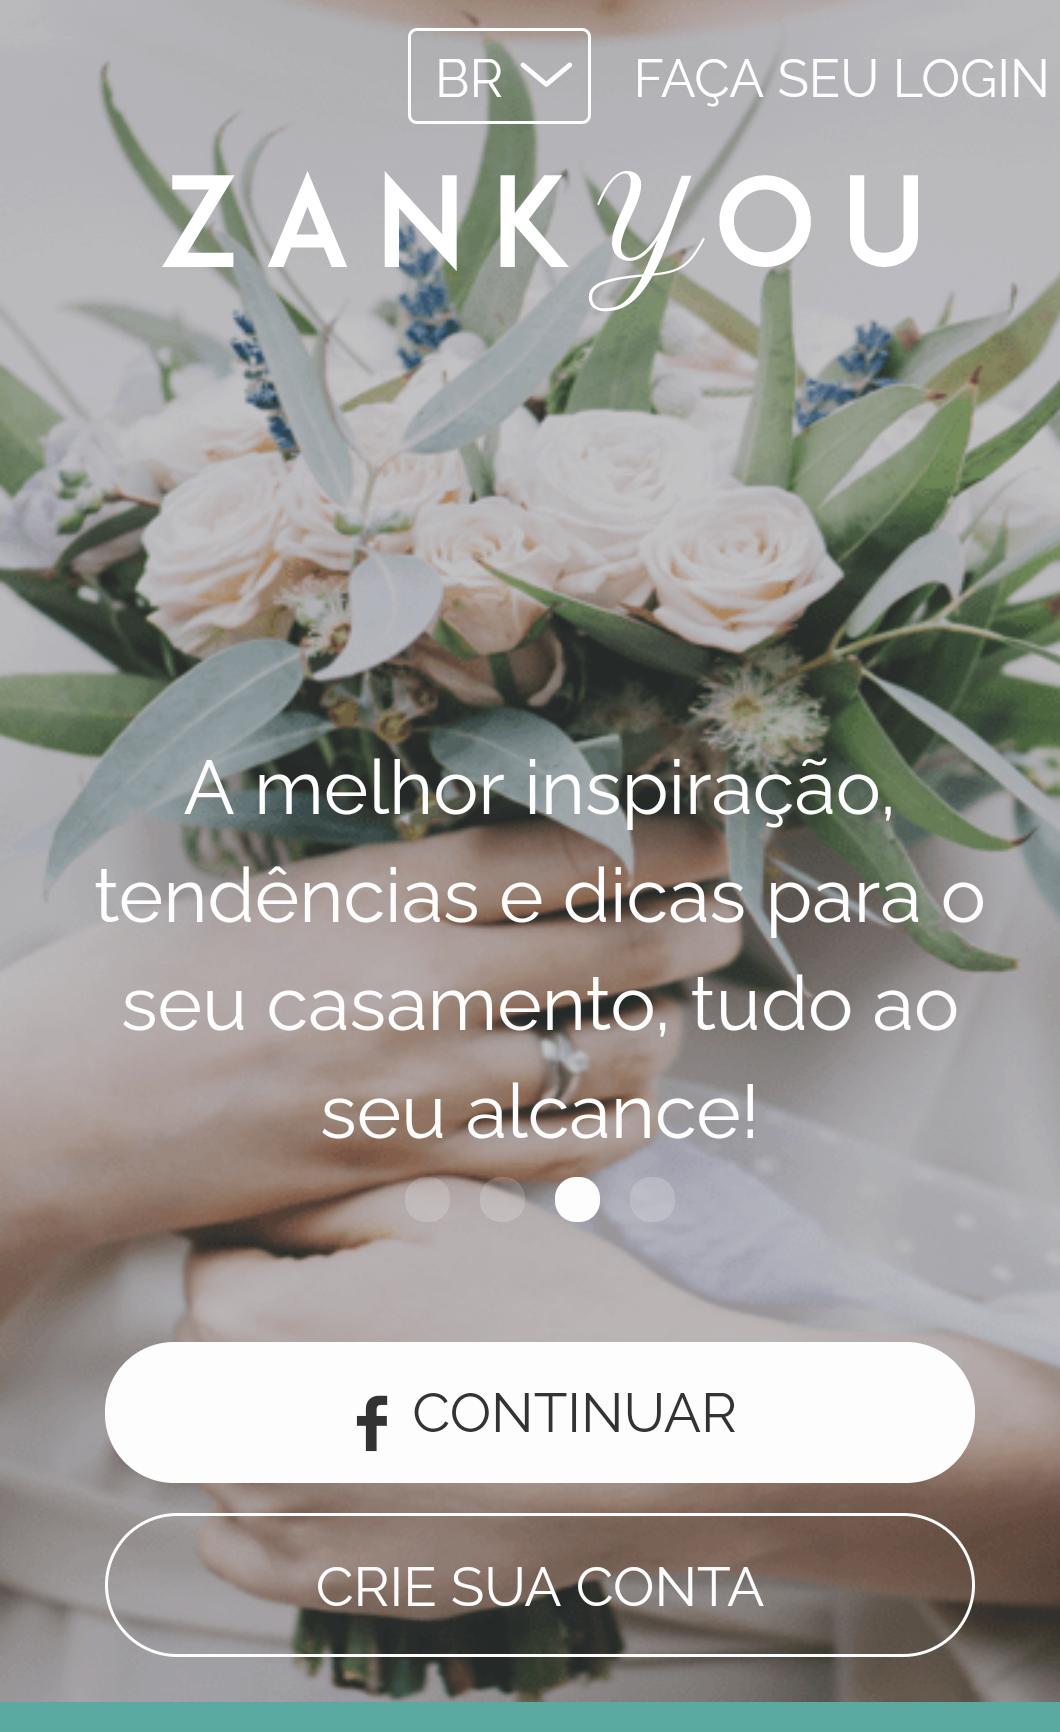 Aplicativos que te ajudam a organizar o casamento - Zankyou